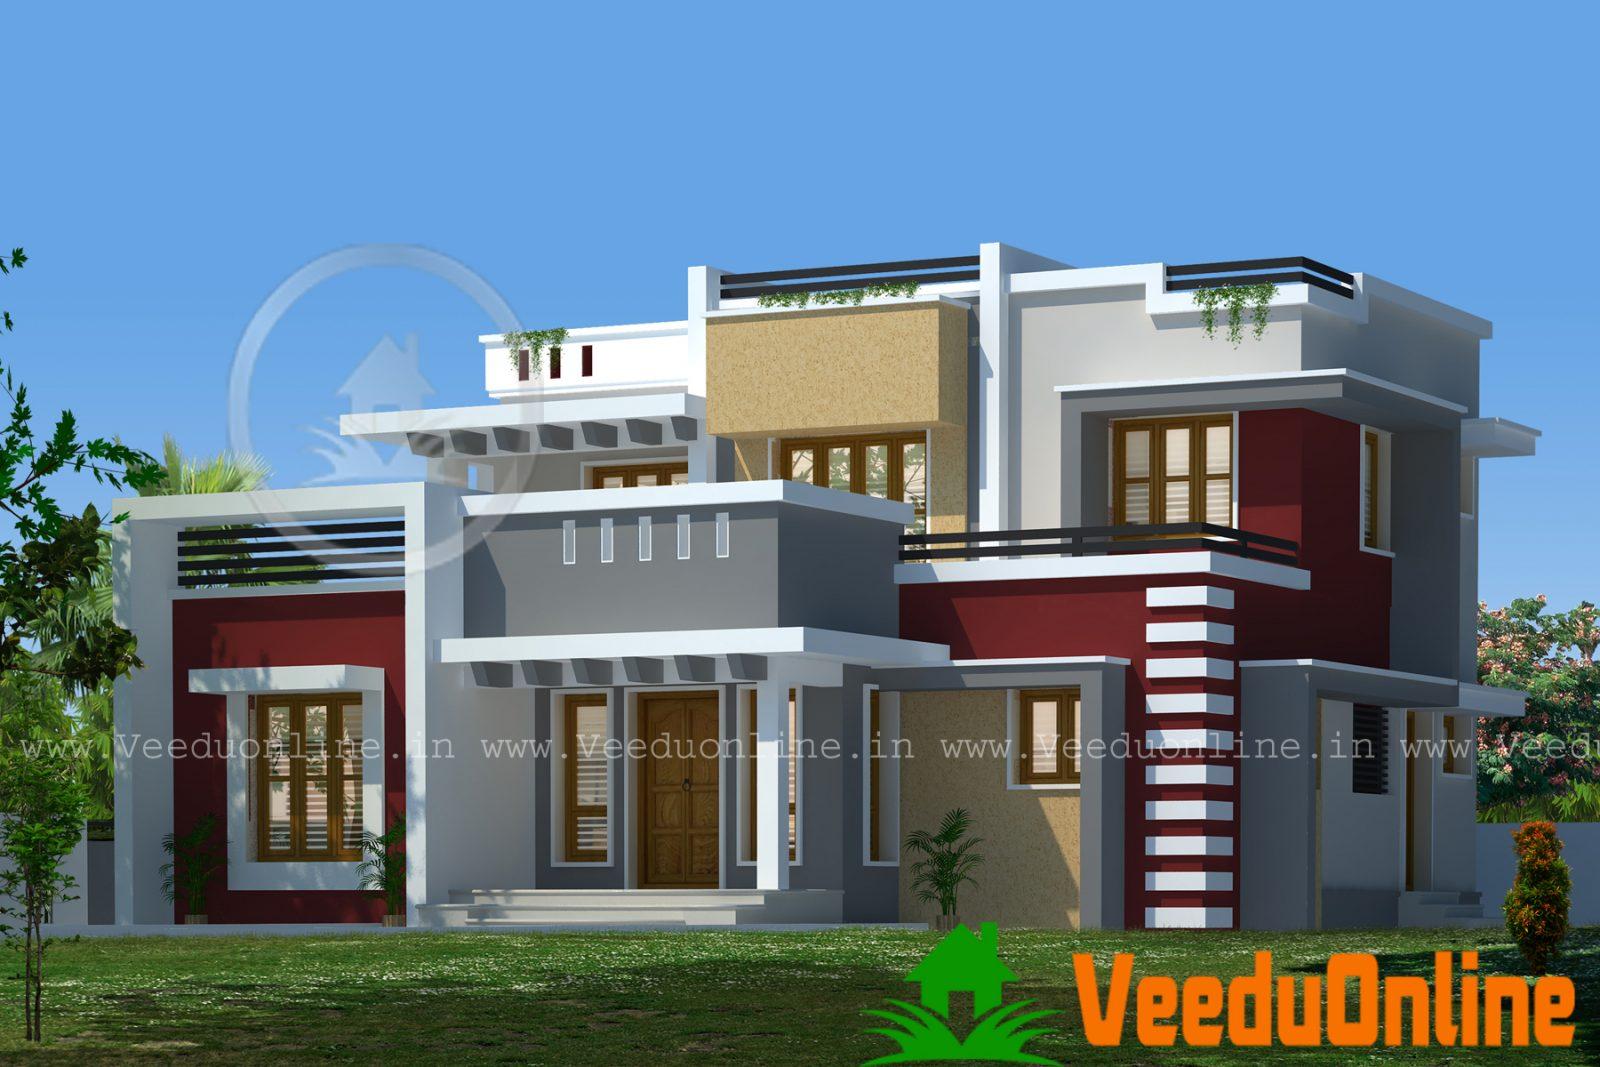 28 february 2015 kerala home design february kerala for Kerala home designs 2015